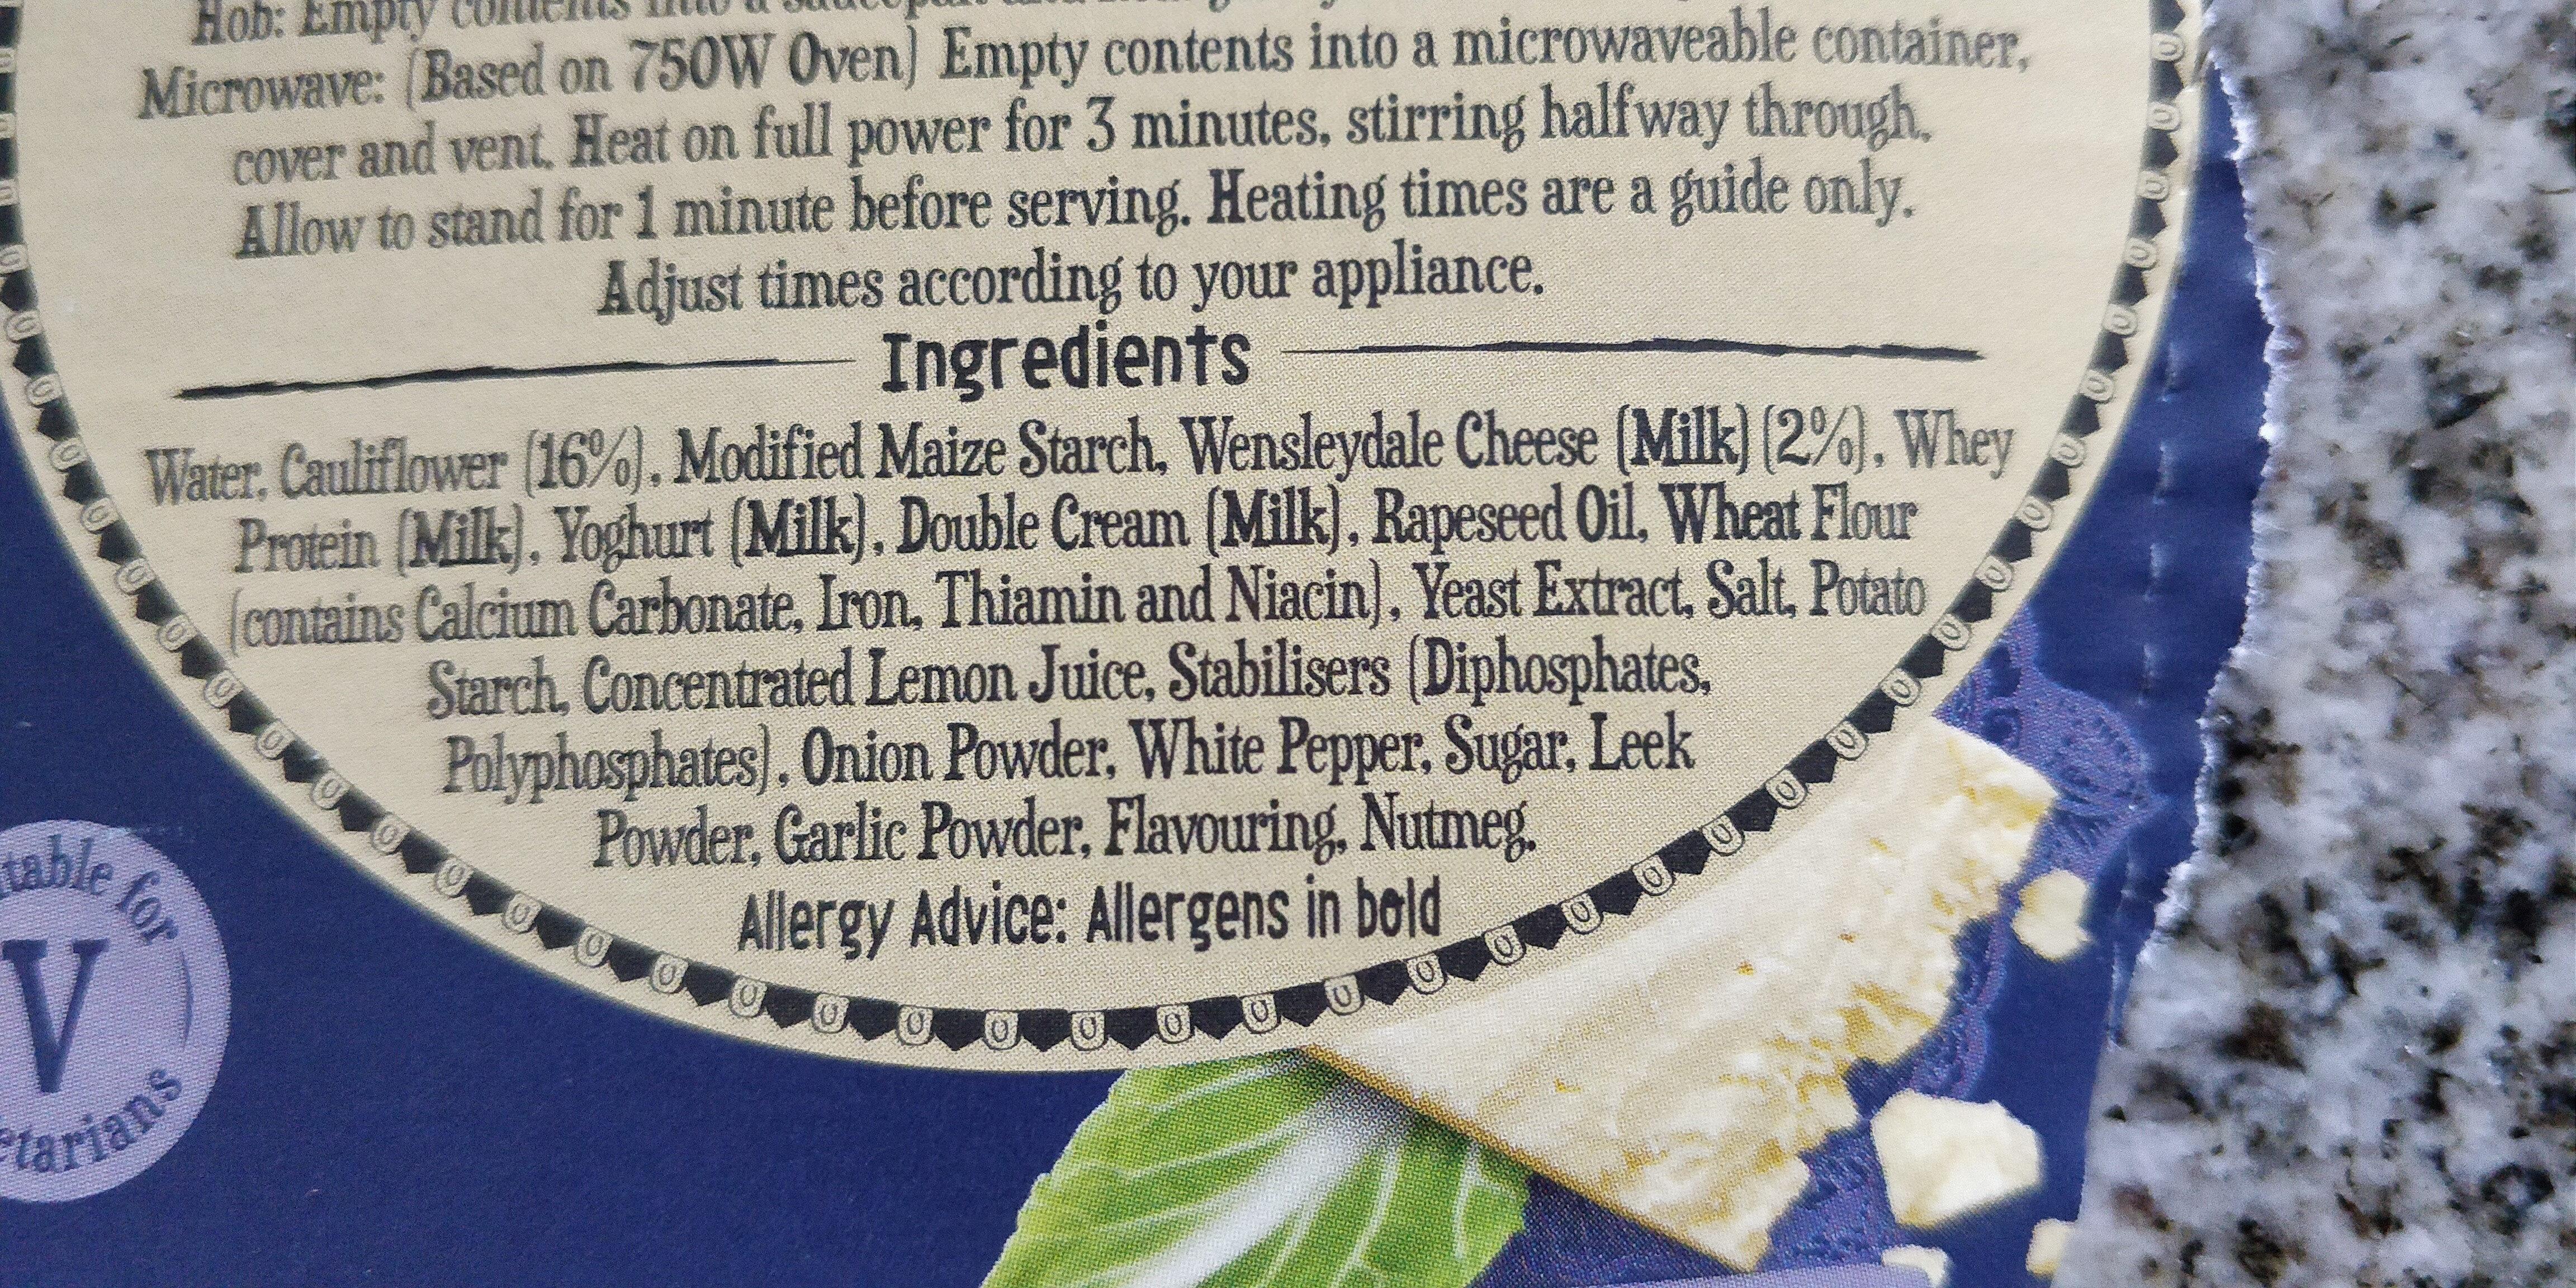 Cauliflower & Wenseydale - Ingredientes - en